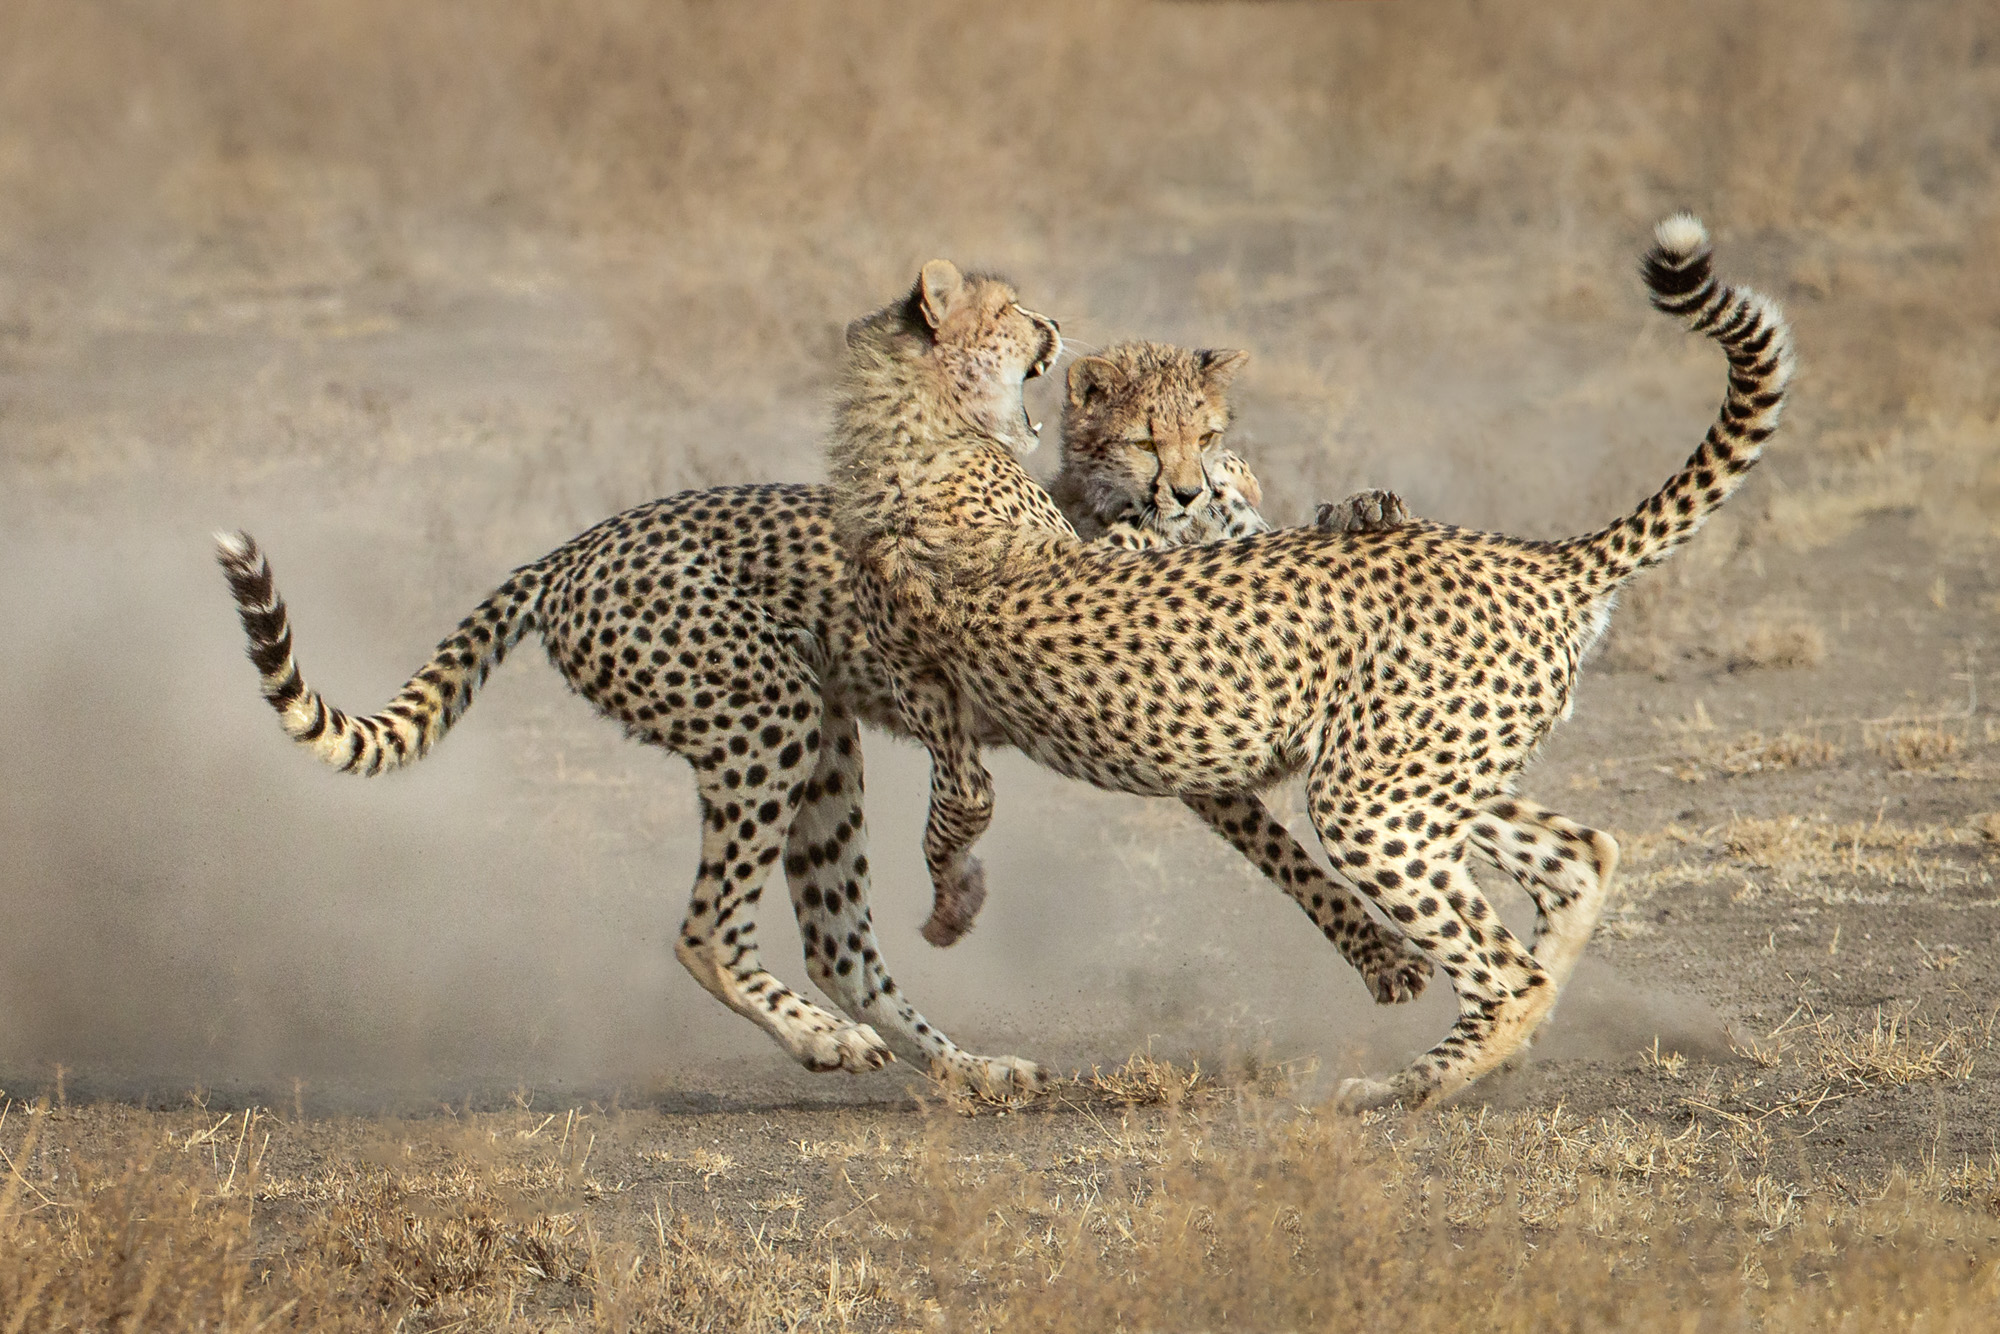 Two cheetahs fighting